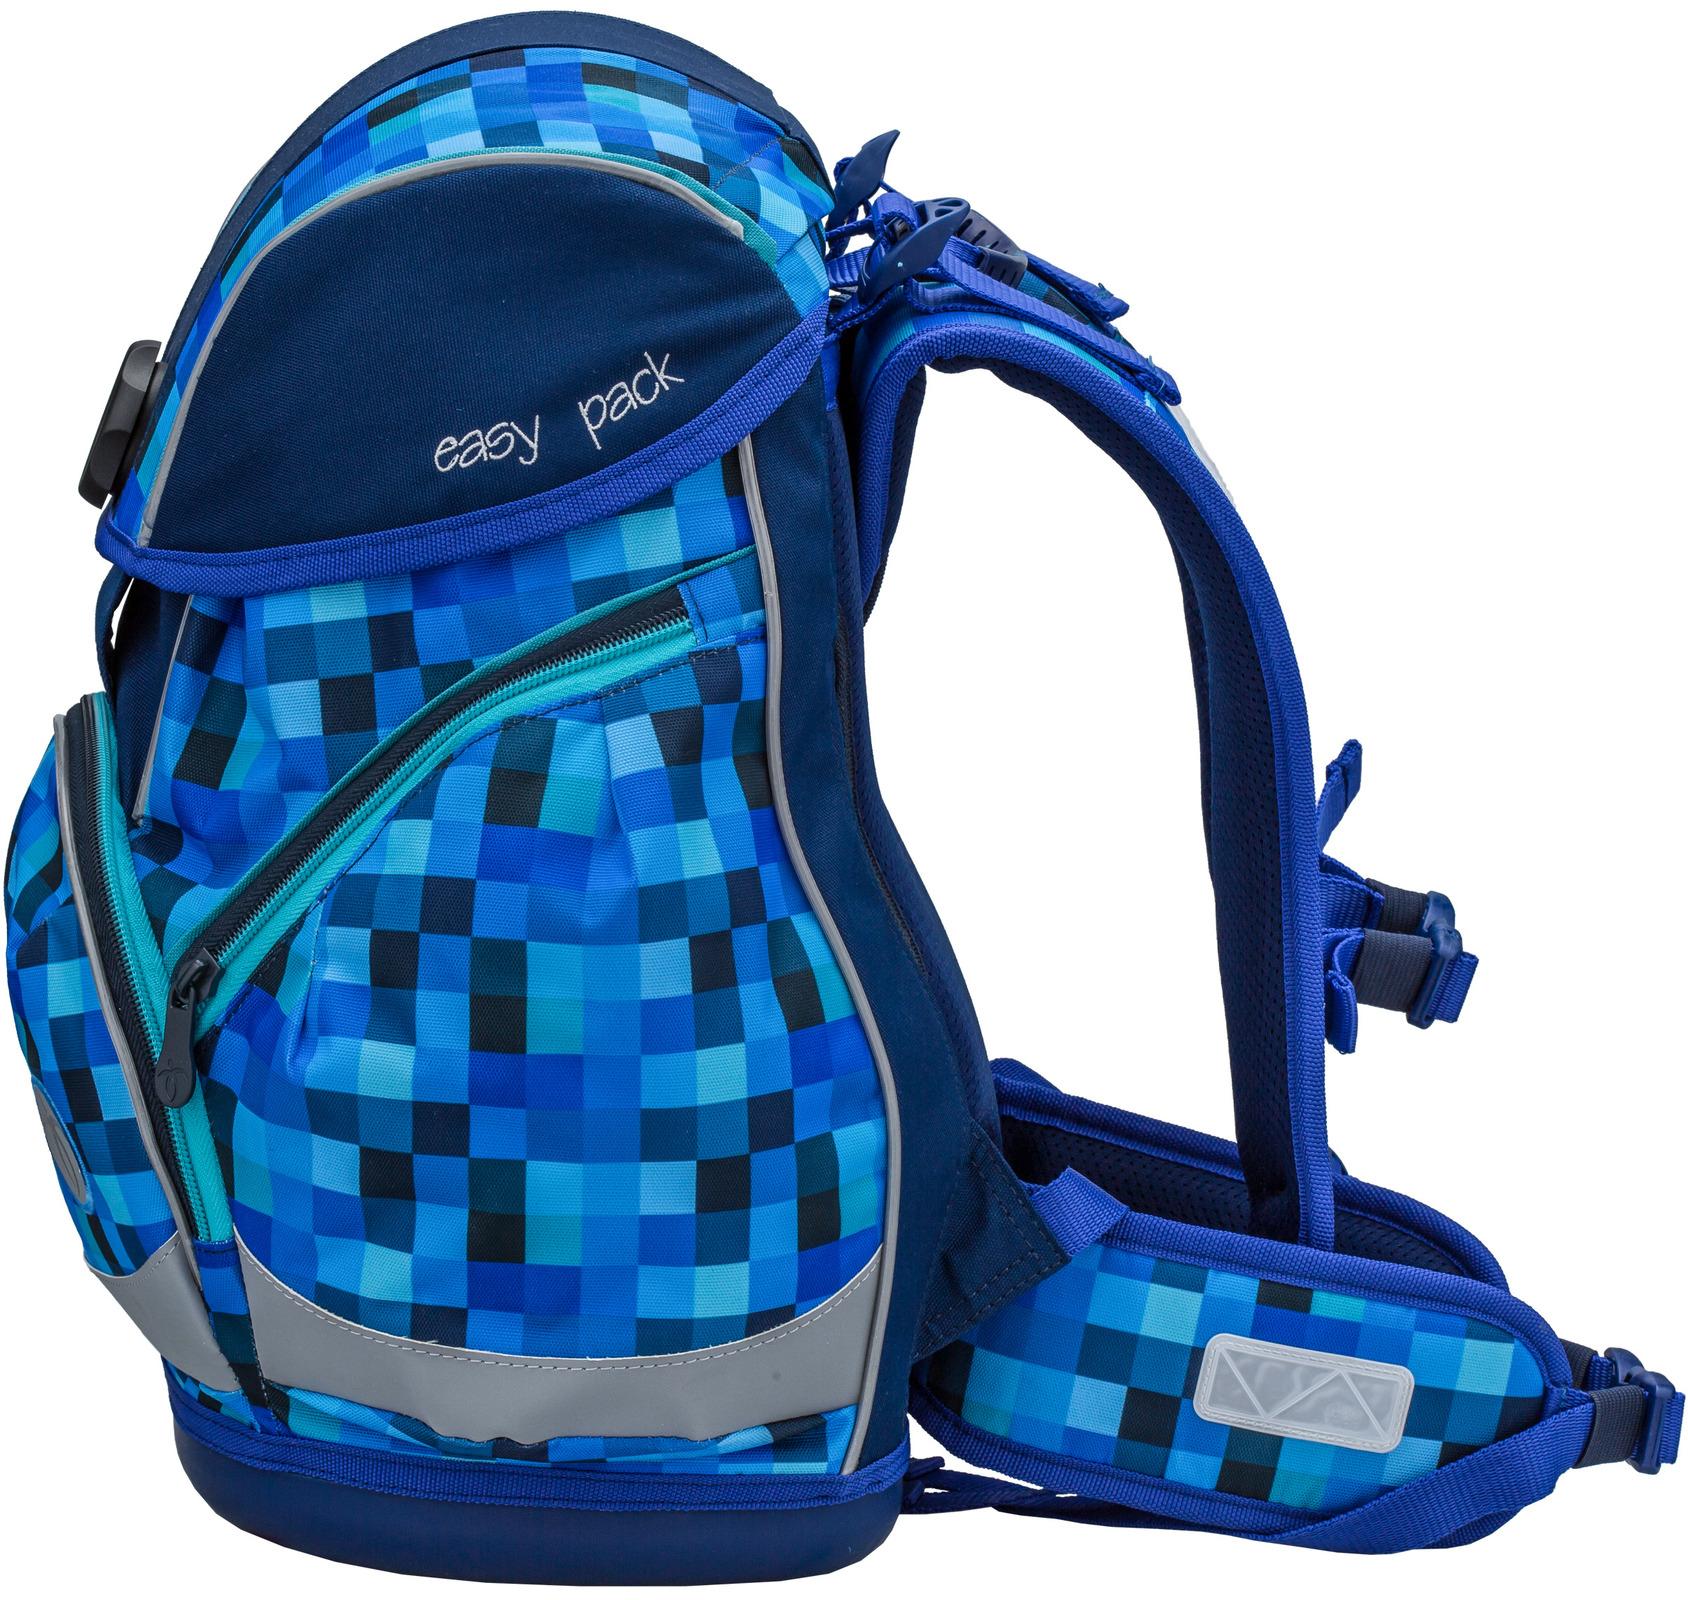 Ранец Belmil EASY PACK 404-40 BLUE PACK + мешок, - фото 3